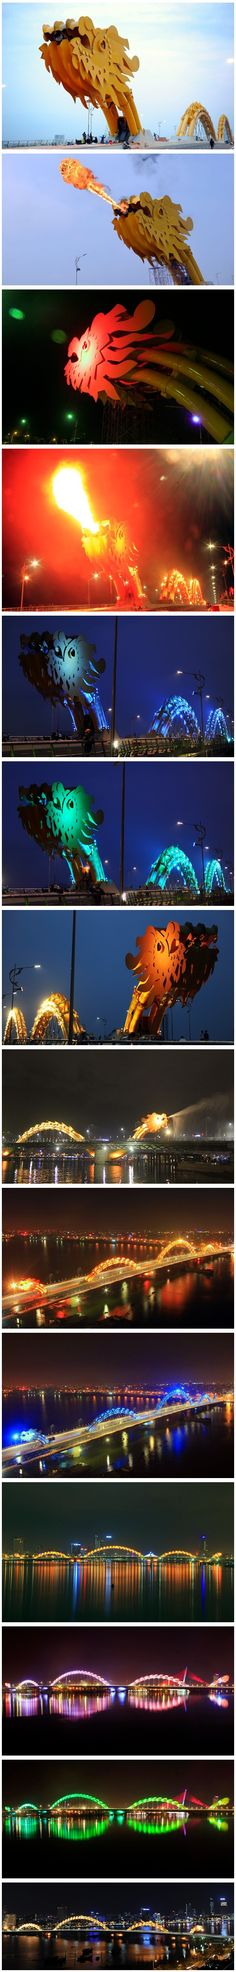 Fire breathing dragon bridge, DaNang.